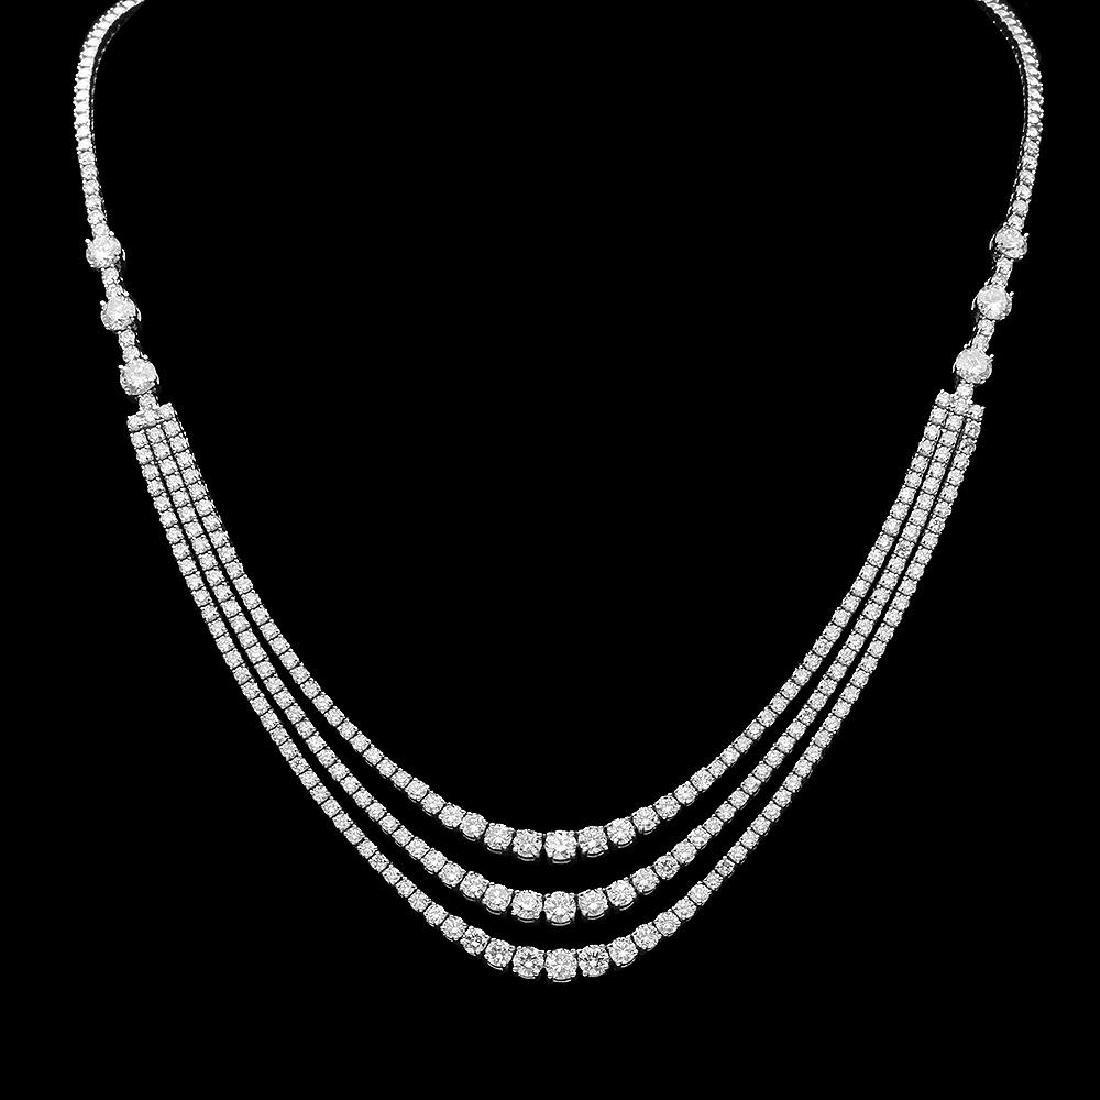 14K Gold 12.20ct Diamond Necklace